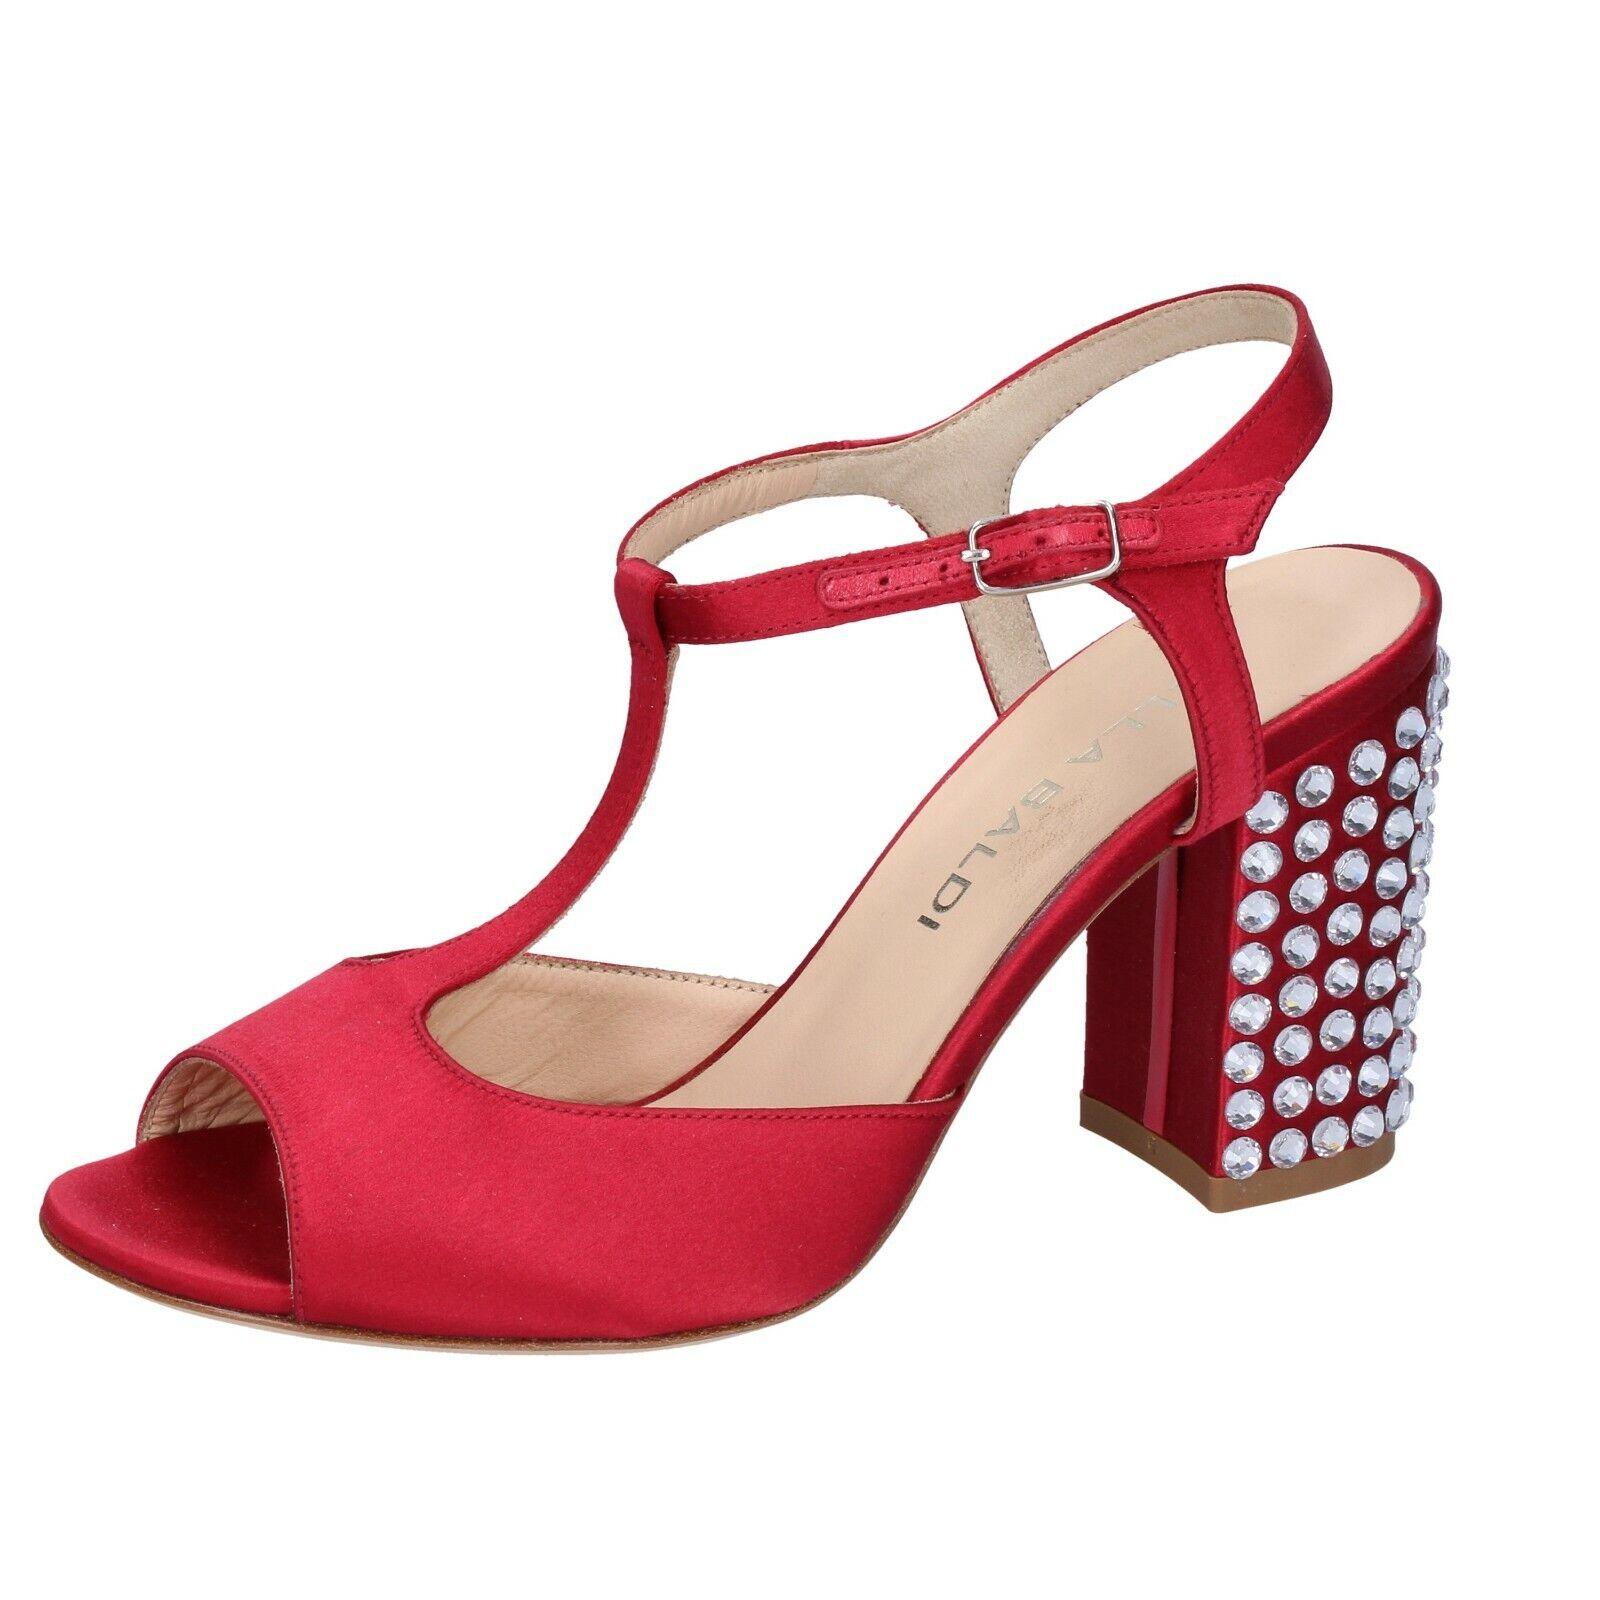 kvinnor kvinnor kvinnor skor LELLA BALDI 36 EU Sandaler röd Satin AH826 -36  stora rabattpriser